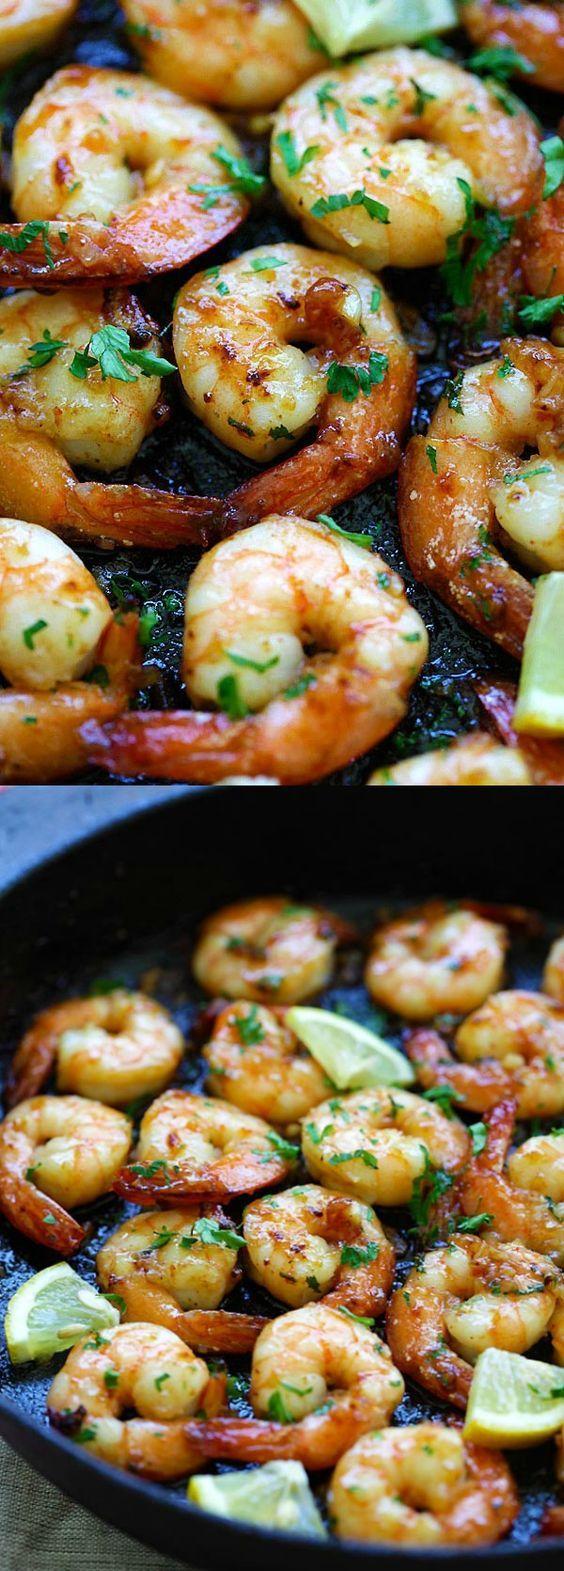 Honey Garlic Shrimp – easy skillet shrimp with honey garlic sauce with only 4 ingredients. The BEST honey garlic shrimp recipe ever | rasamalaysia.com